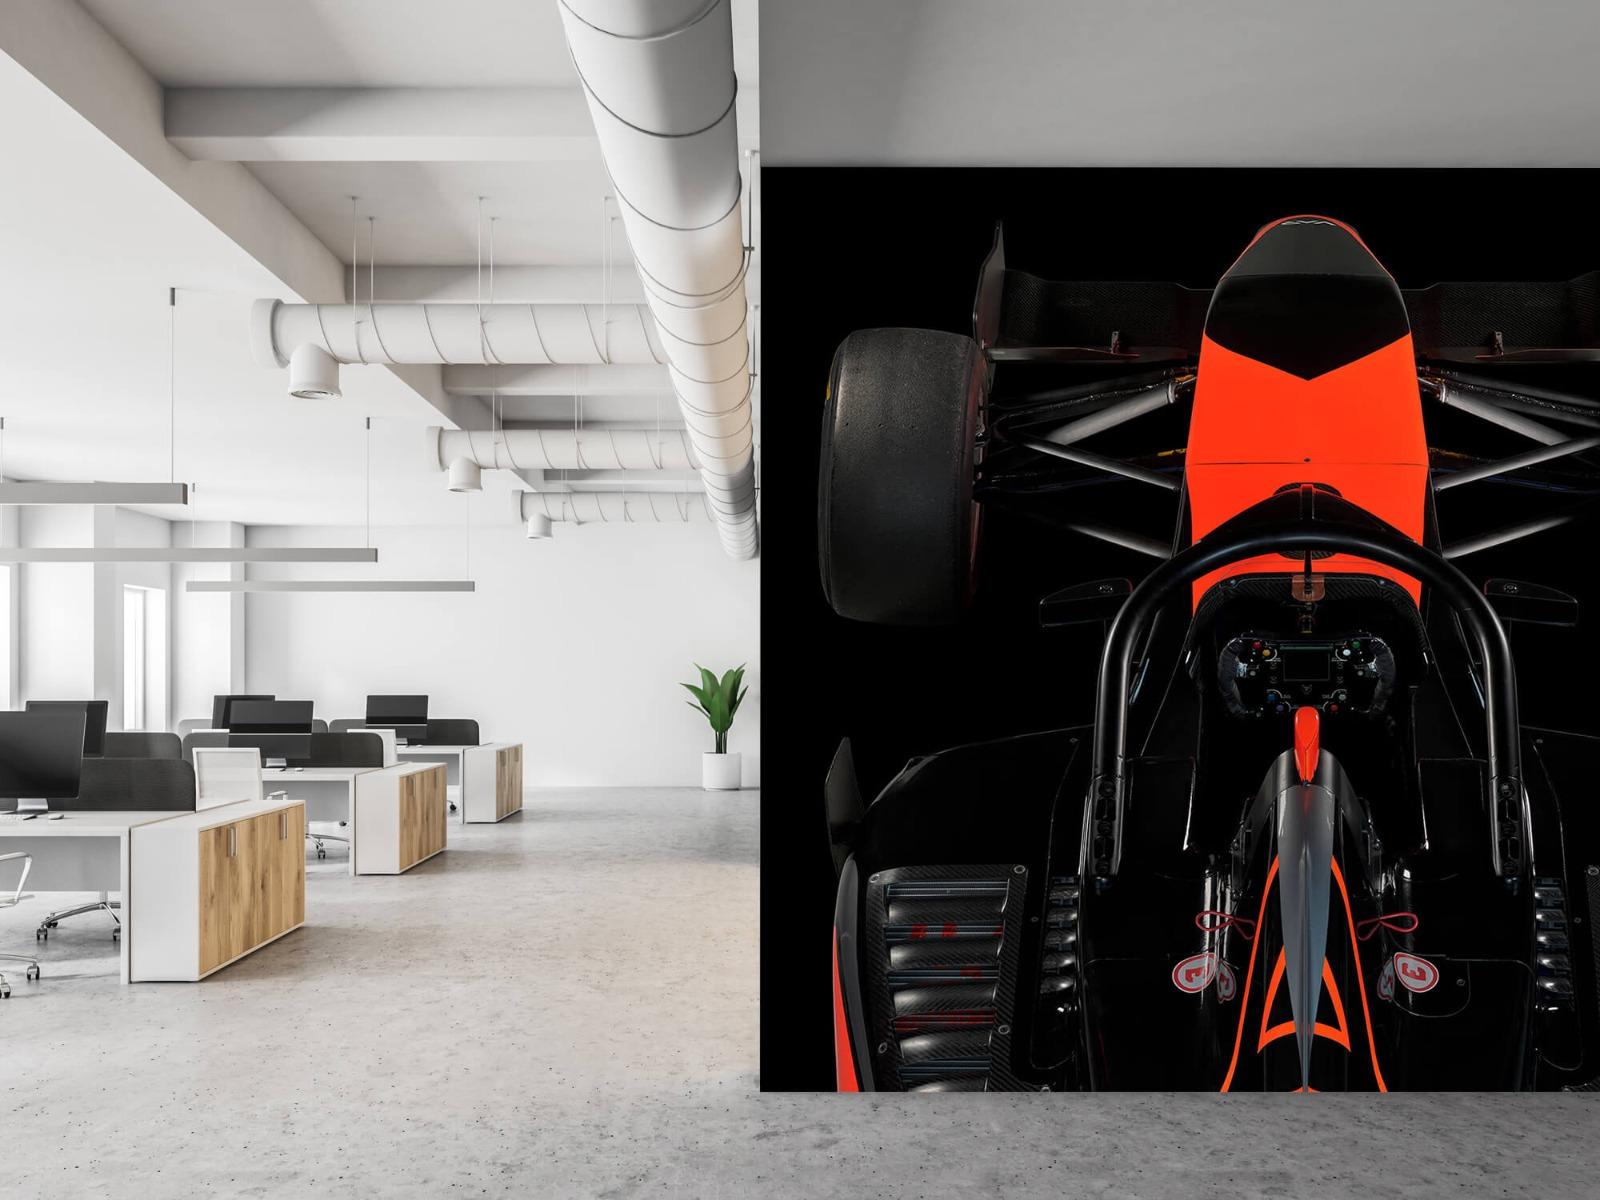 Sportauto's - Formule 3 - Cockpit view - dark - Tienerkamer 21